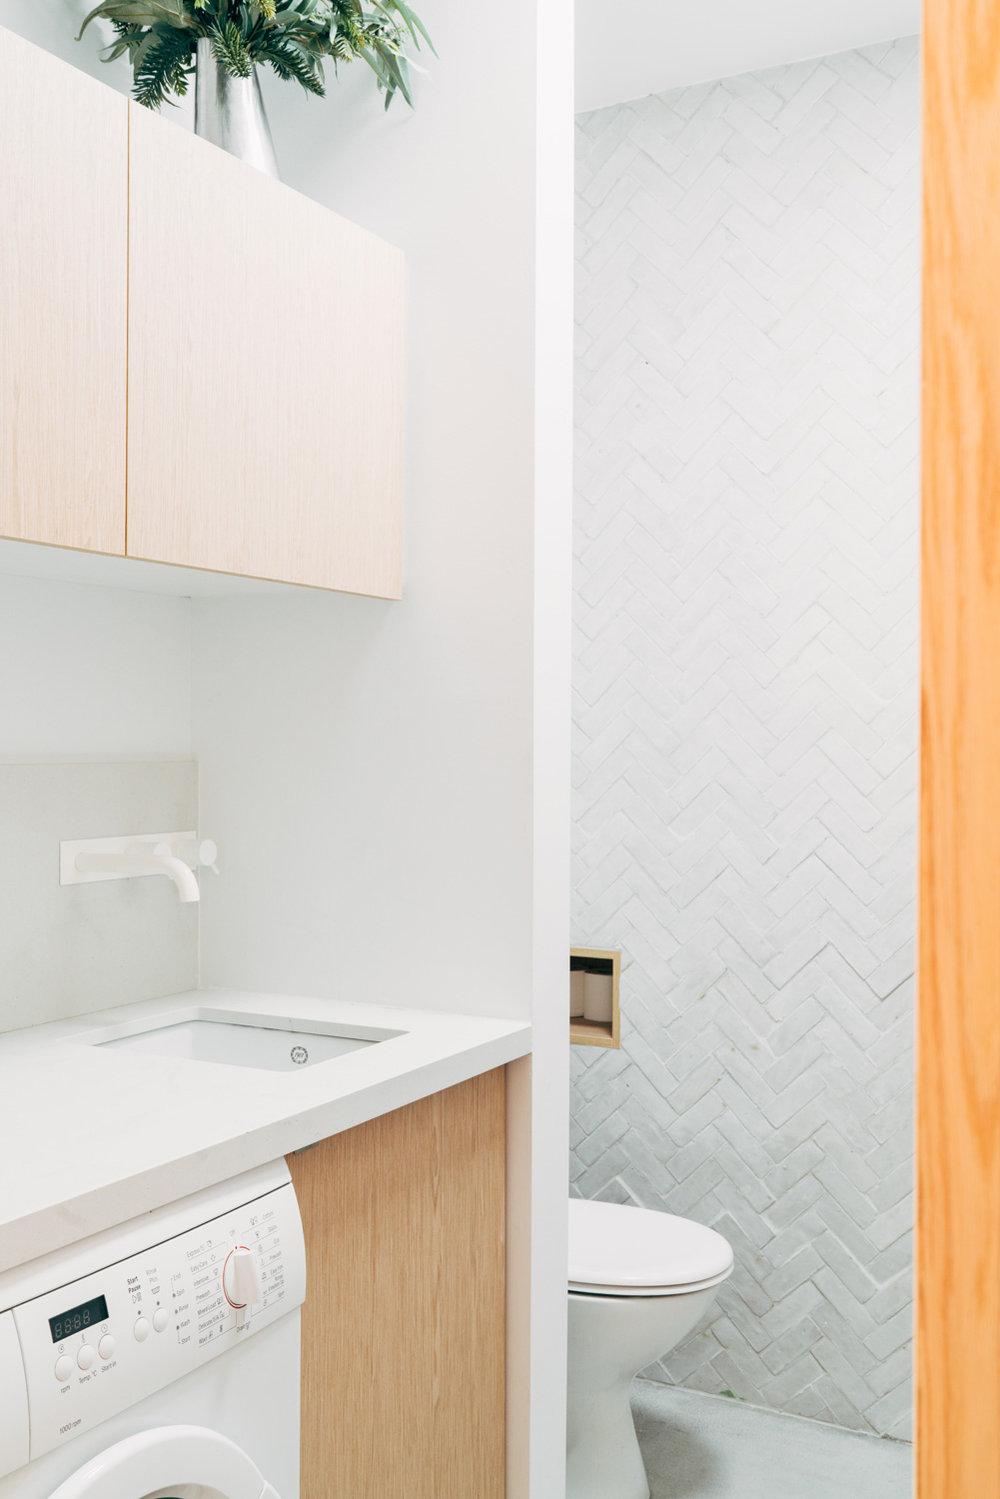 Tilesofezra BEJMAT Igloo feature wall moroccan tile B GABBE Interior design.jpg